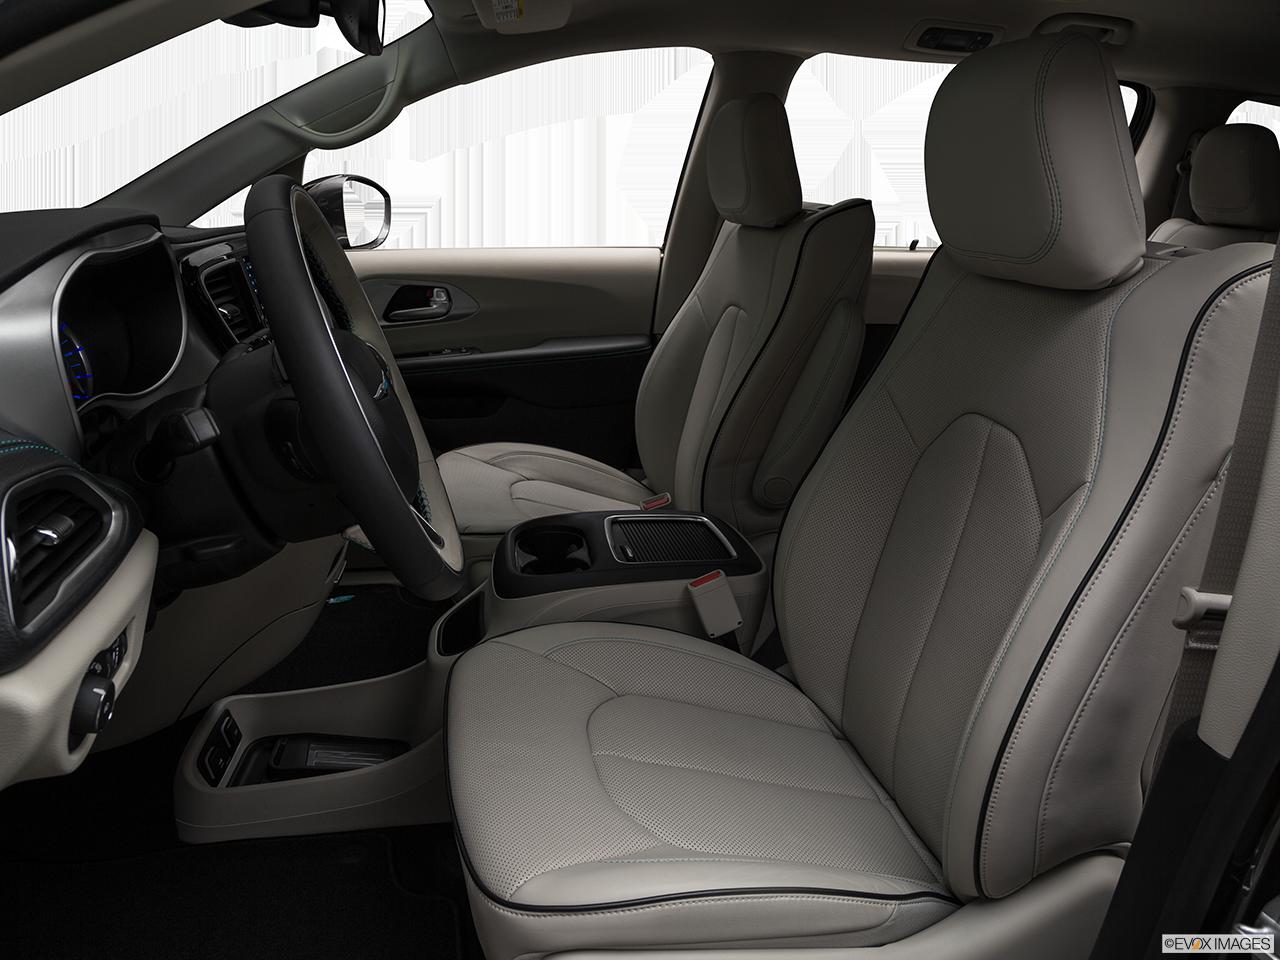 2020 Chrysler Pacifica Hybrid photo